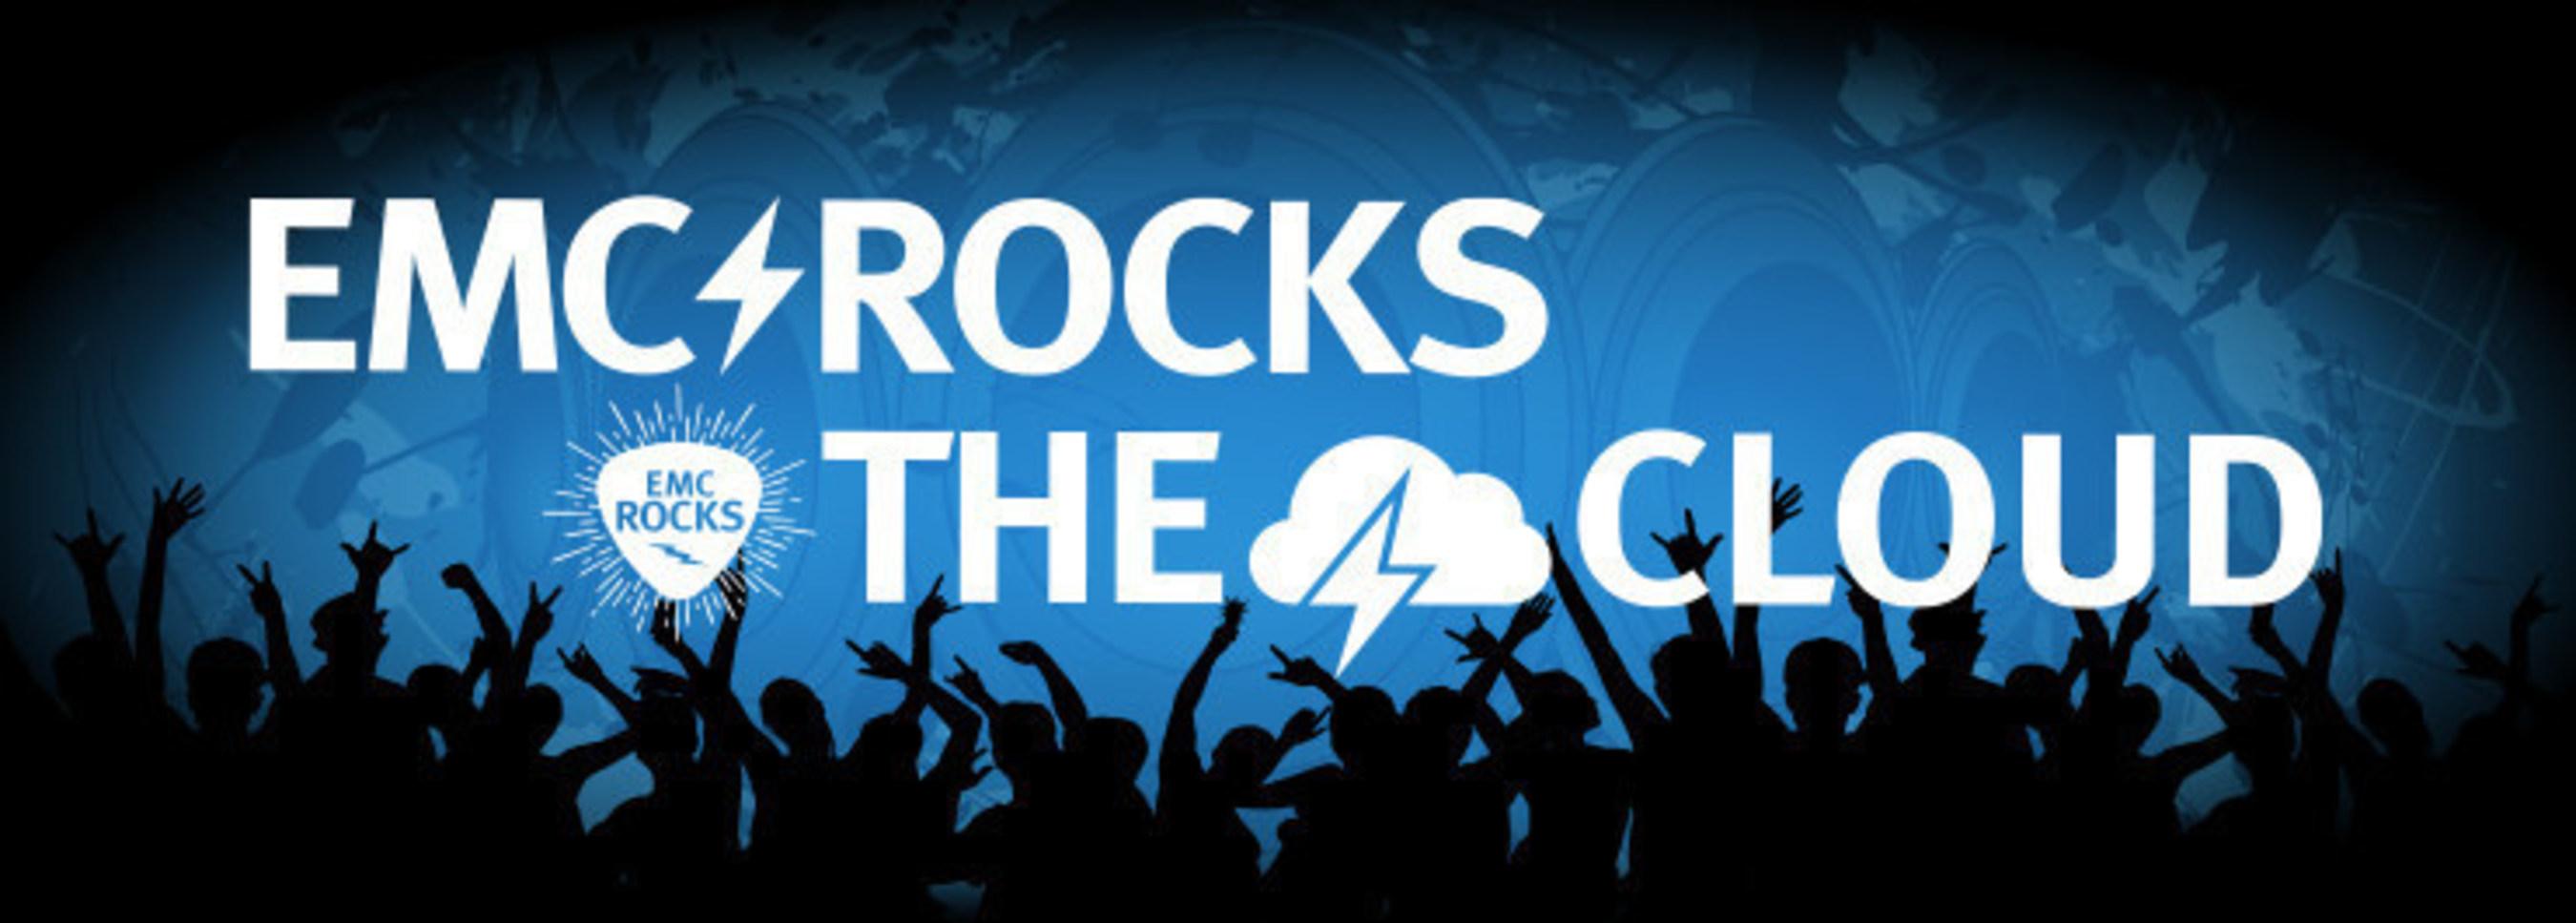 EMC Rocks The Cloud